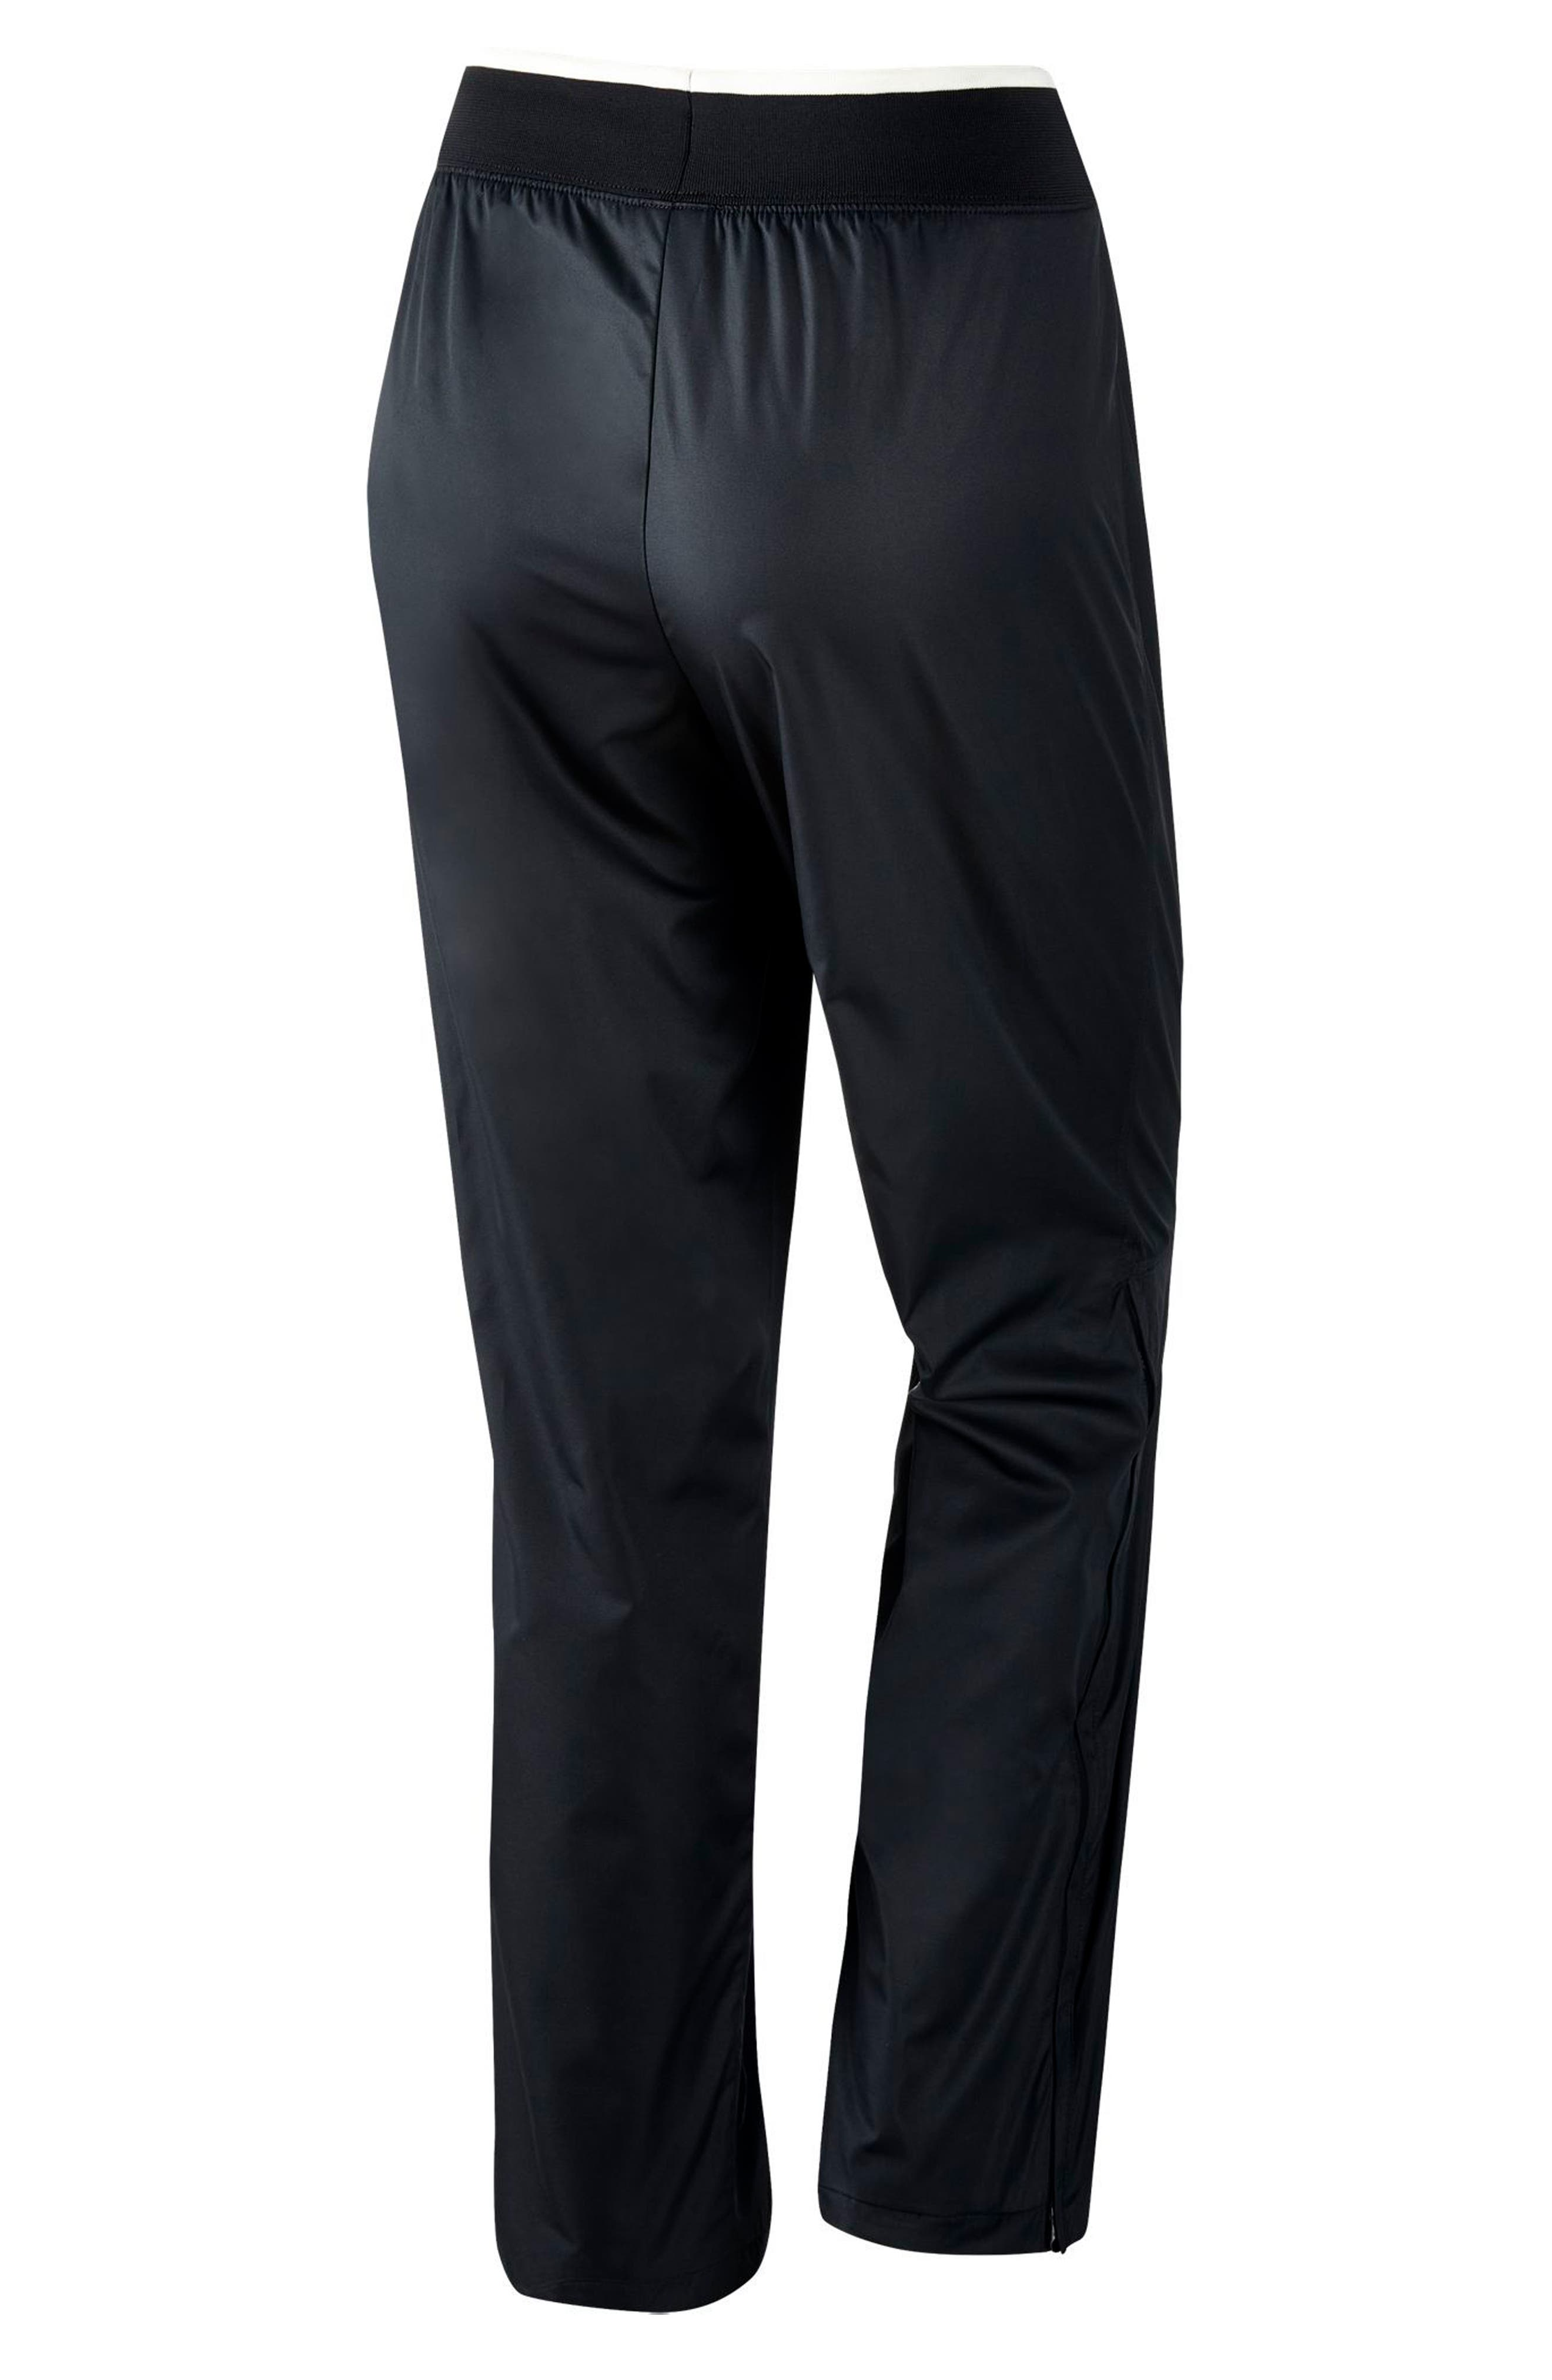 Sportswear Women's Stretch Faille Pants,                             Alternate thumbnail 6, color,                             BLACK